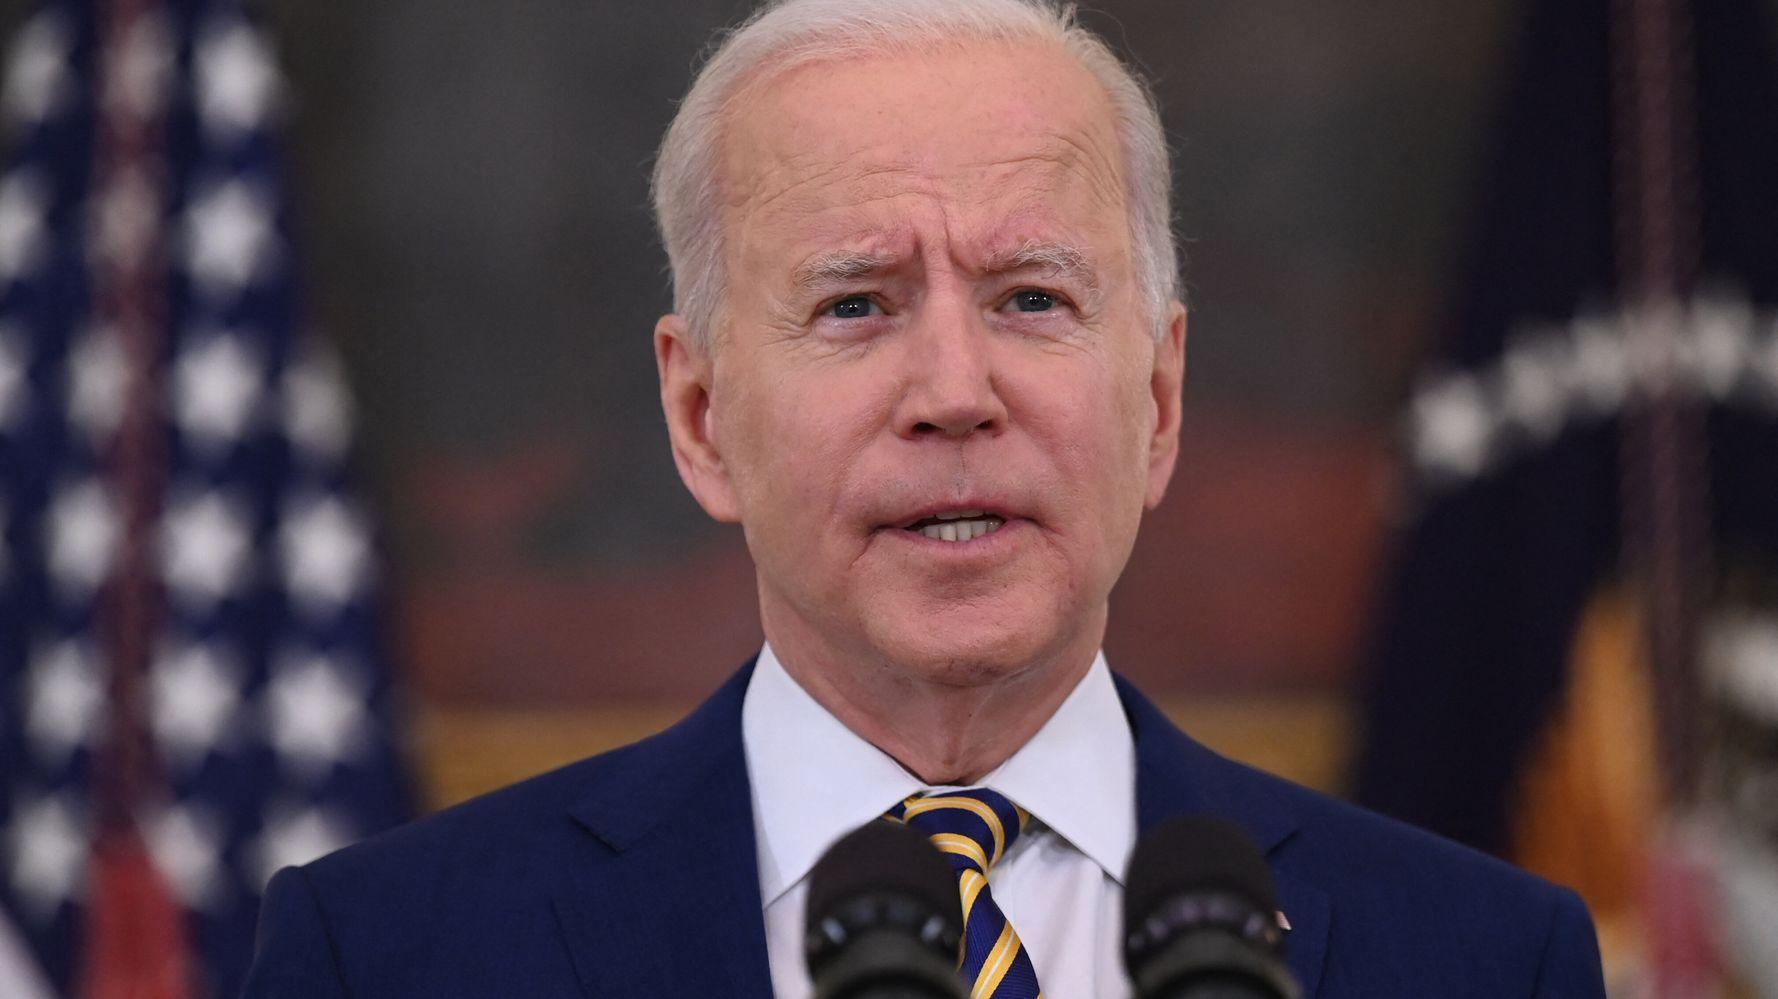 Joe Biden Announces 300 Million Coronavirus Vaccines Have Been Administered